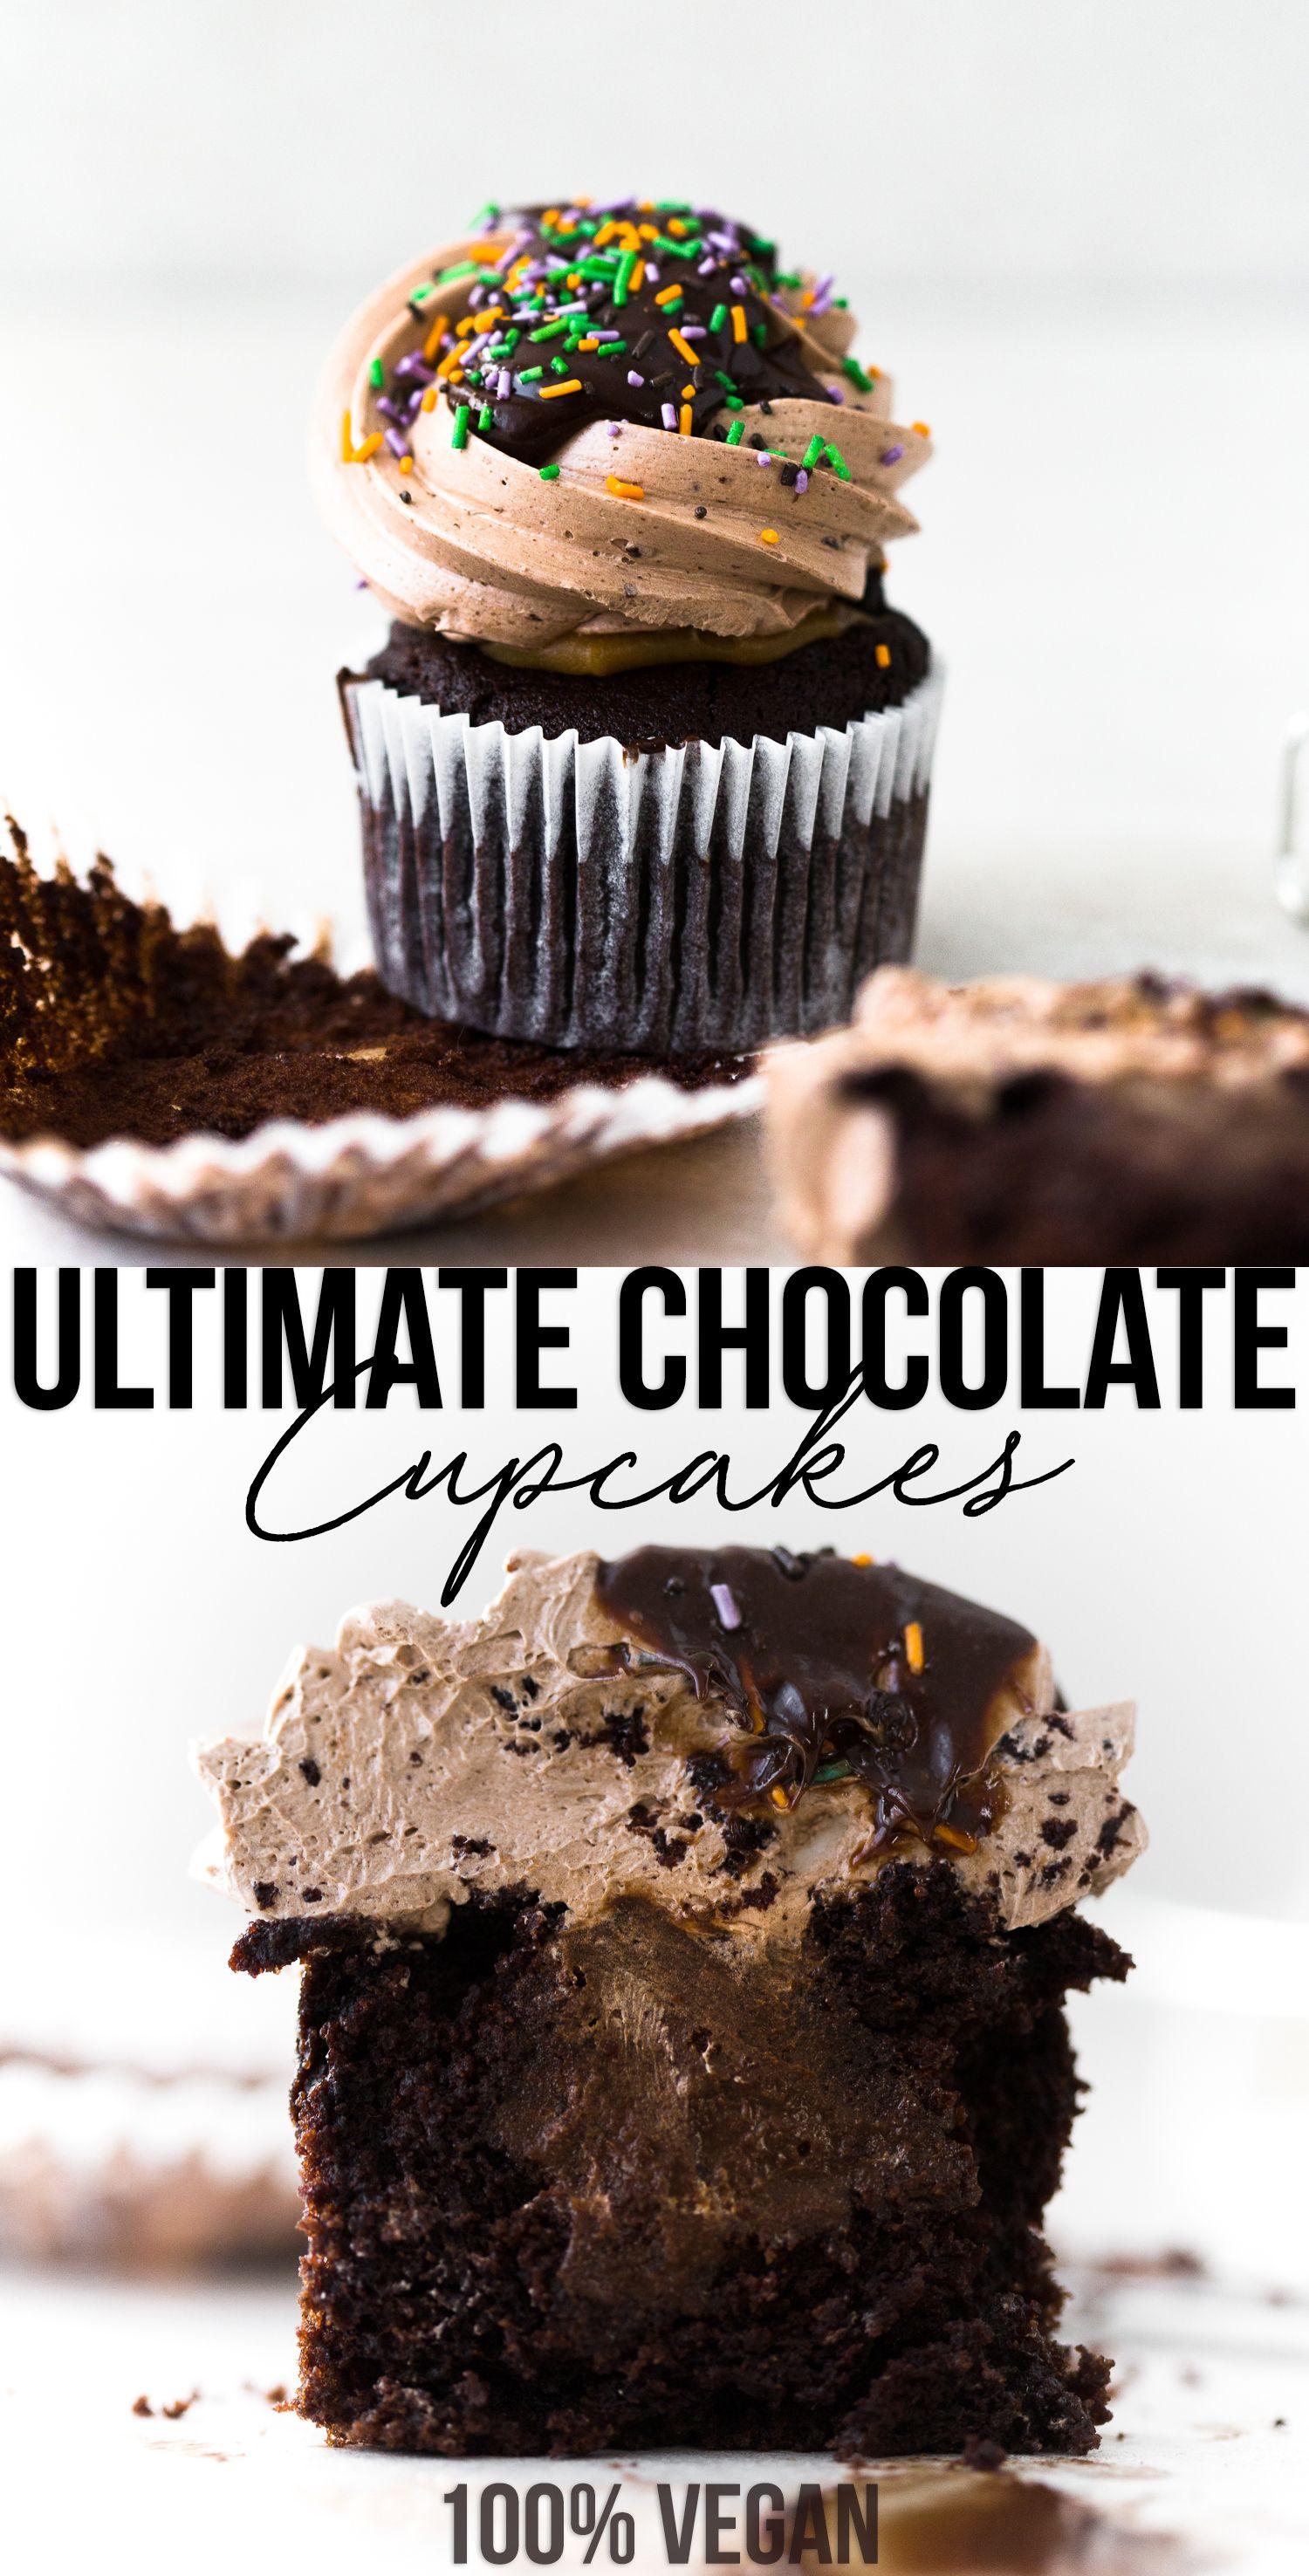 Ultimate Vegan Chocolate Cupcakes Recipe Vegan Chocolate